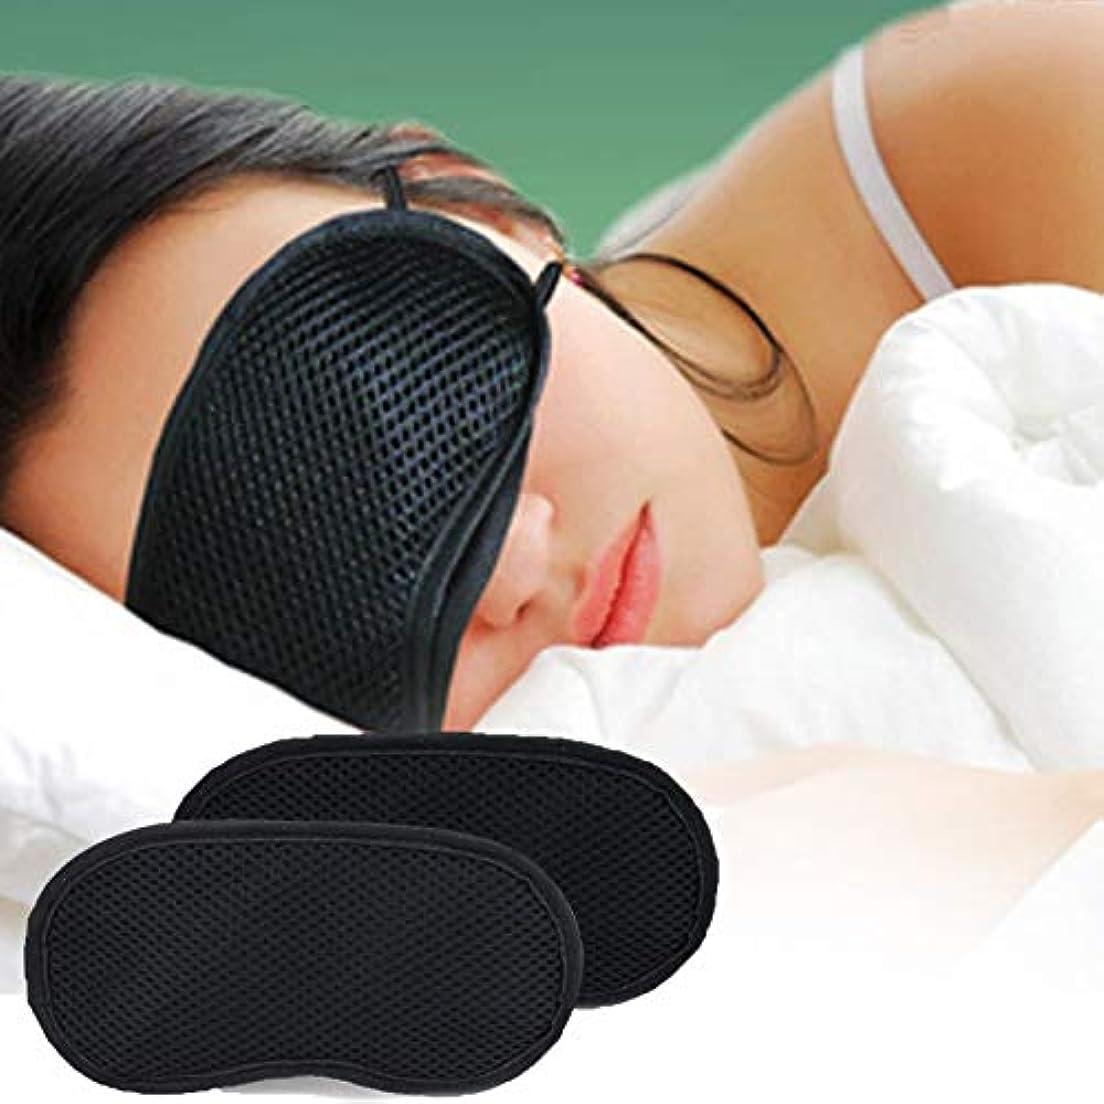 NOTE 竹炭睡眠アイマスク用旅行残りの長さ調節可能な睡眠補助目隠し包帯アイパッチギフト用男性女性